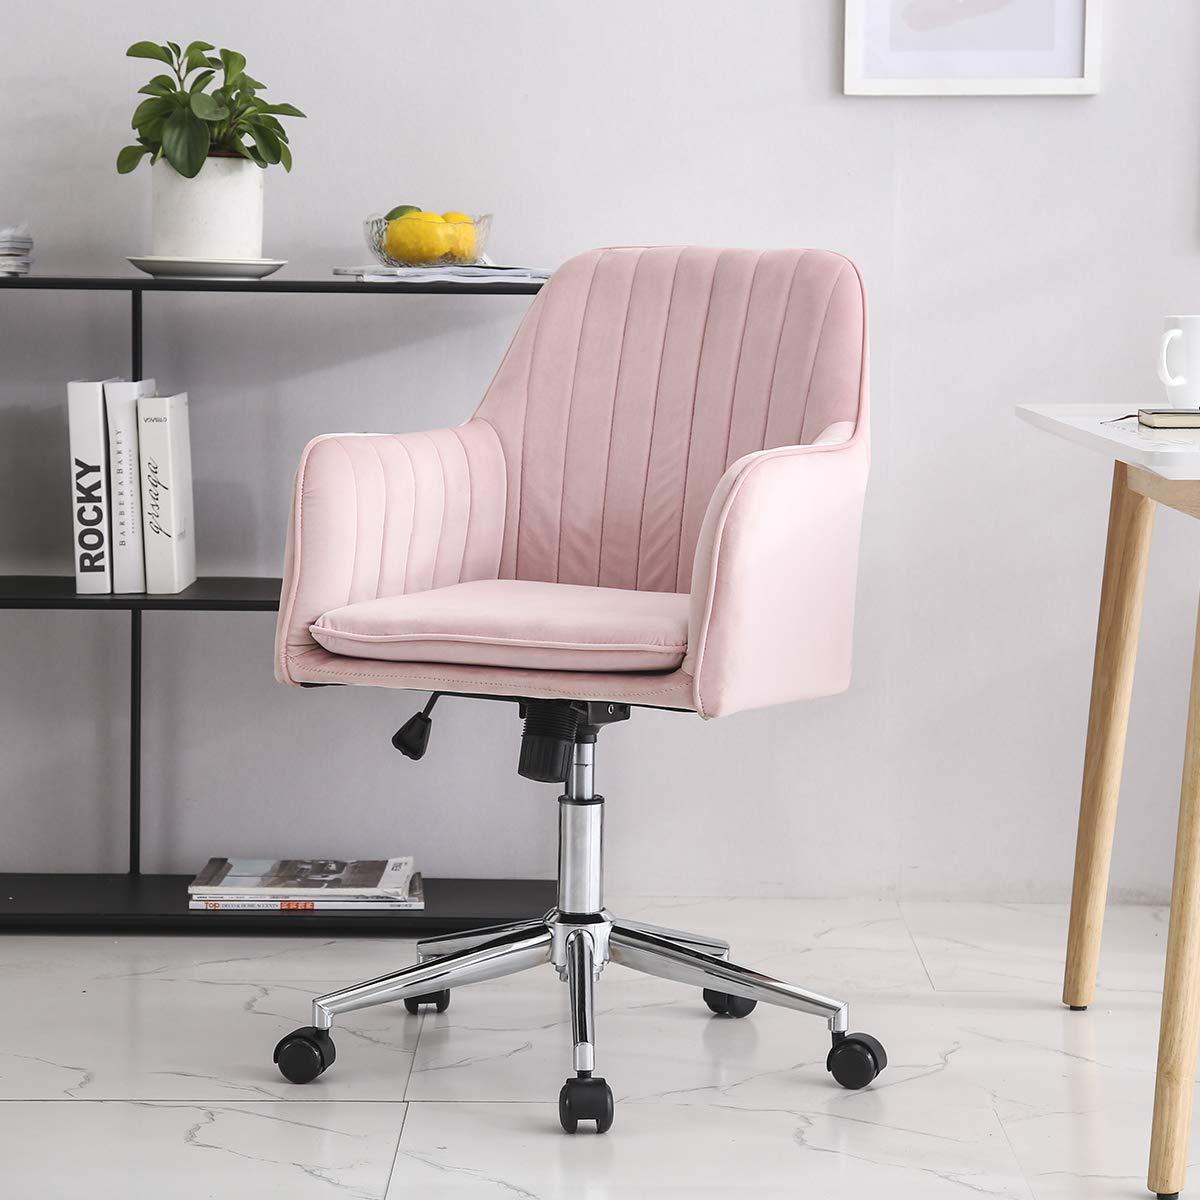 Hironpal Modern Velvet Office Chair Armc- Buy Online in El